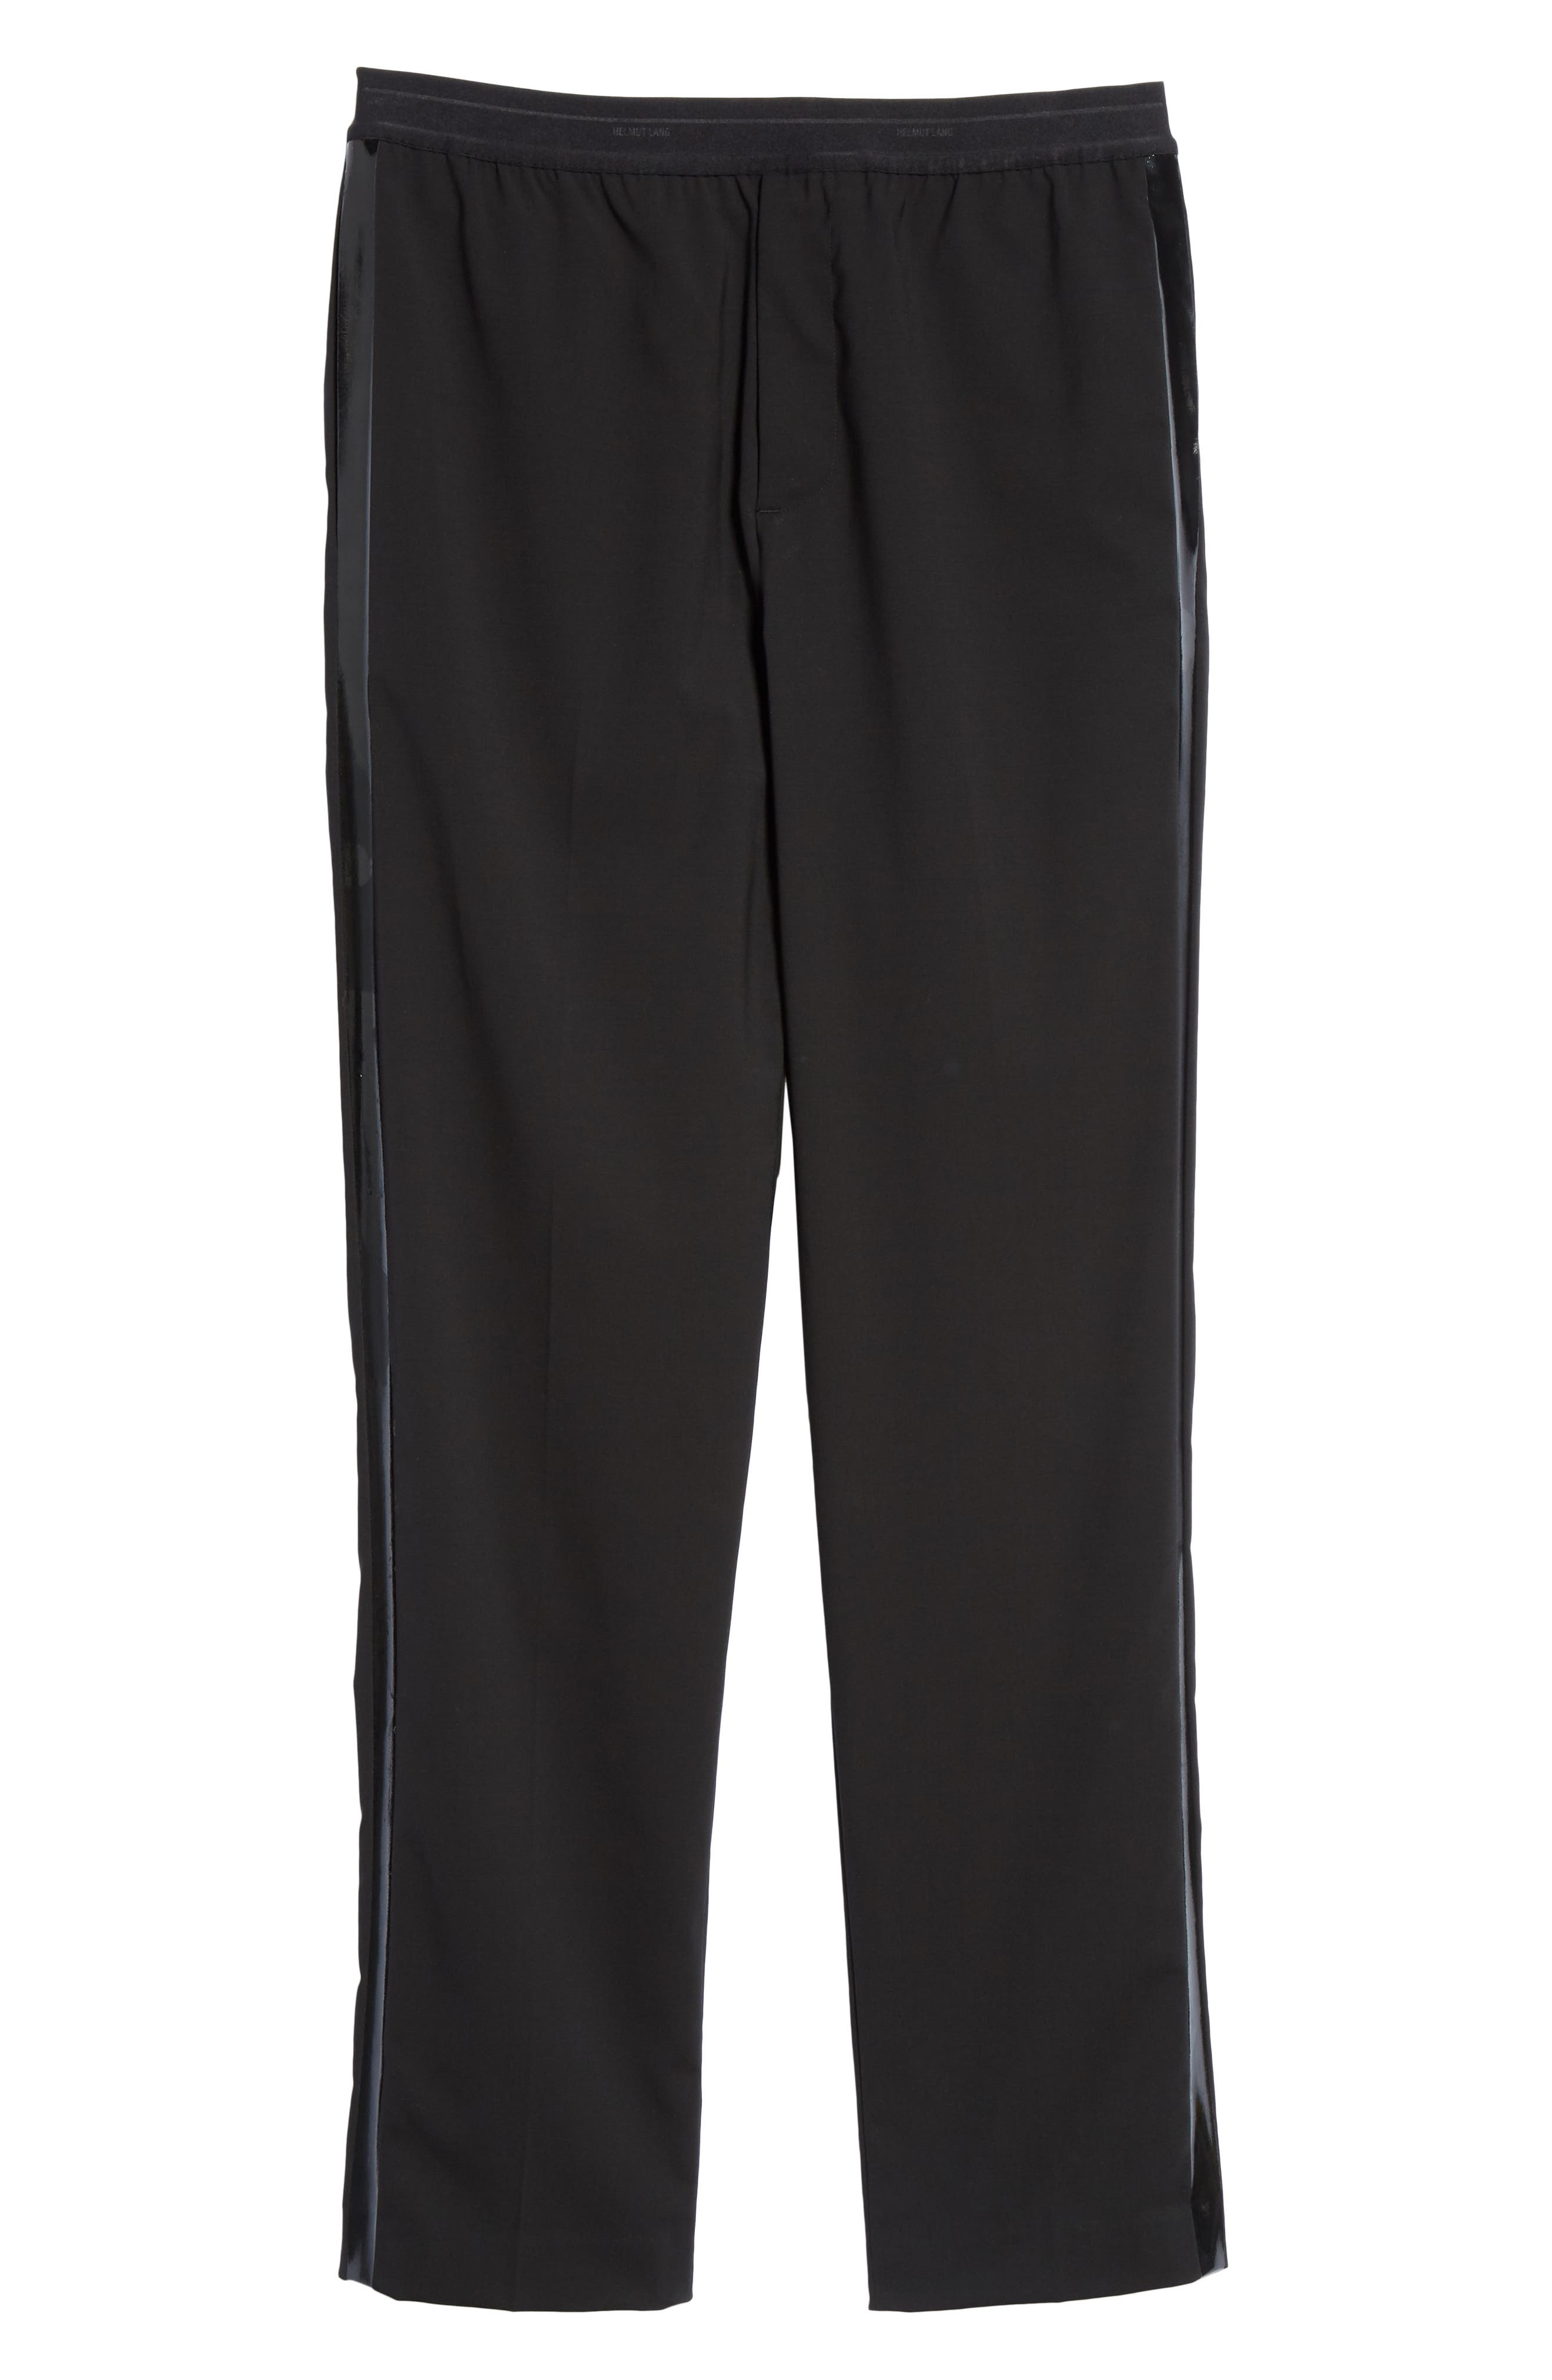 HELMUT LANG, Wool Pants, Alternate thumbnail 6, color, BLACK ON BLACK